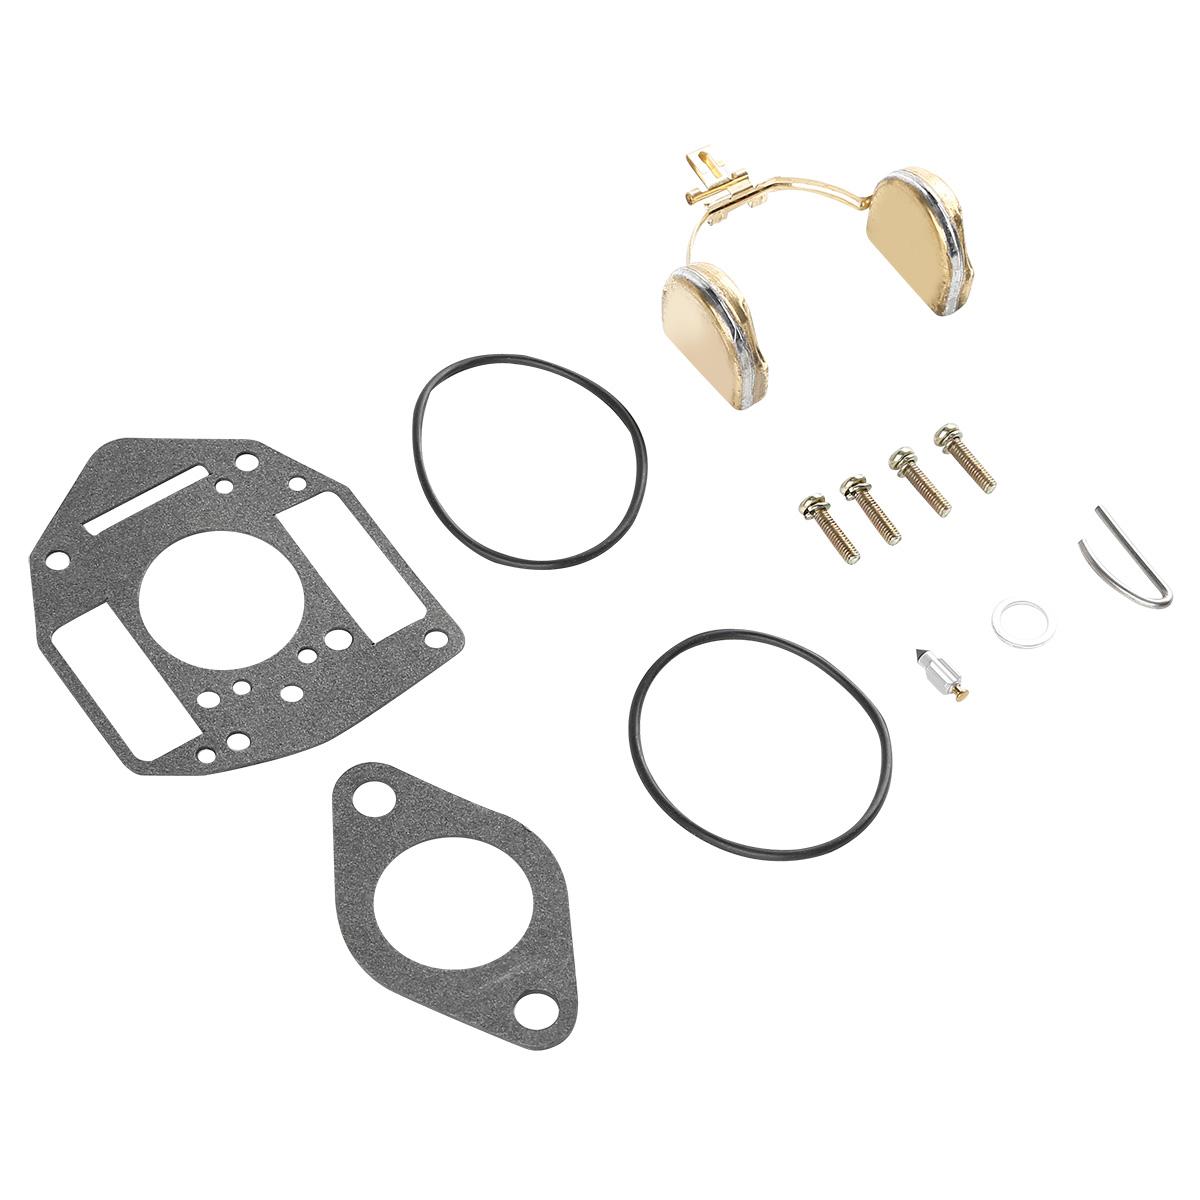 Onan Carburetor Rebuild Kit: Durable For Your Onan Engine